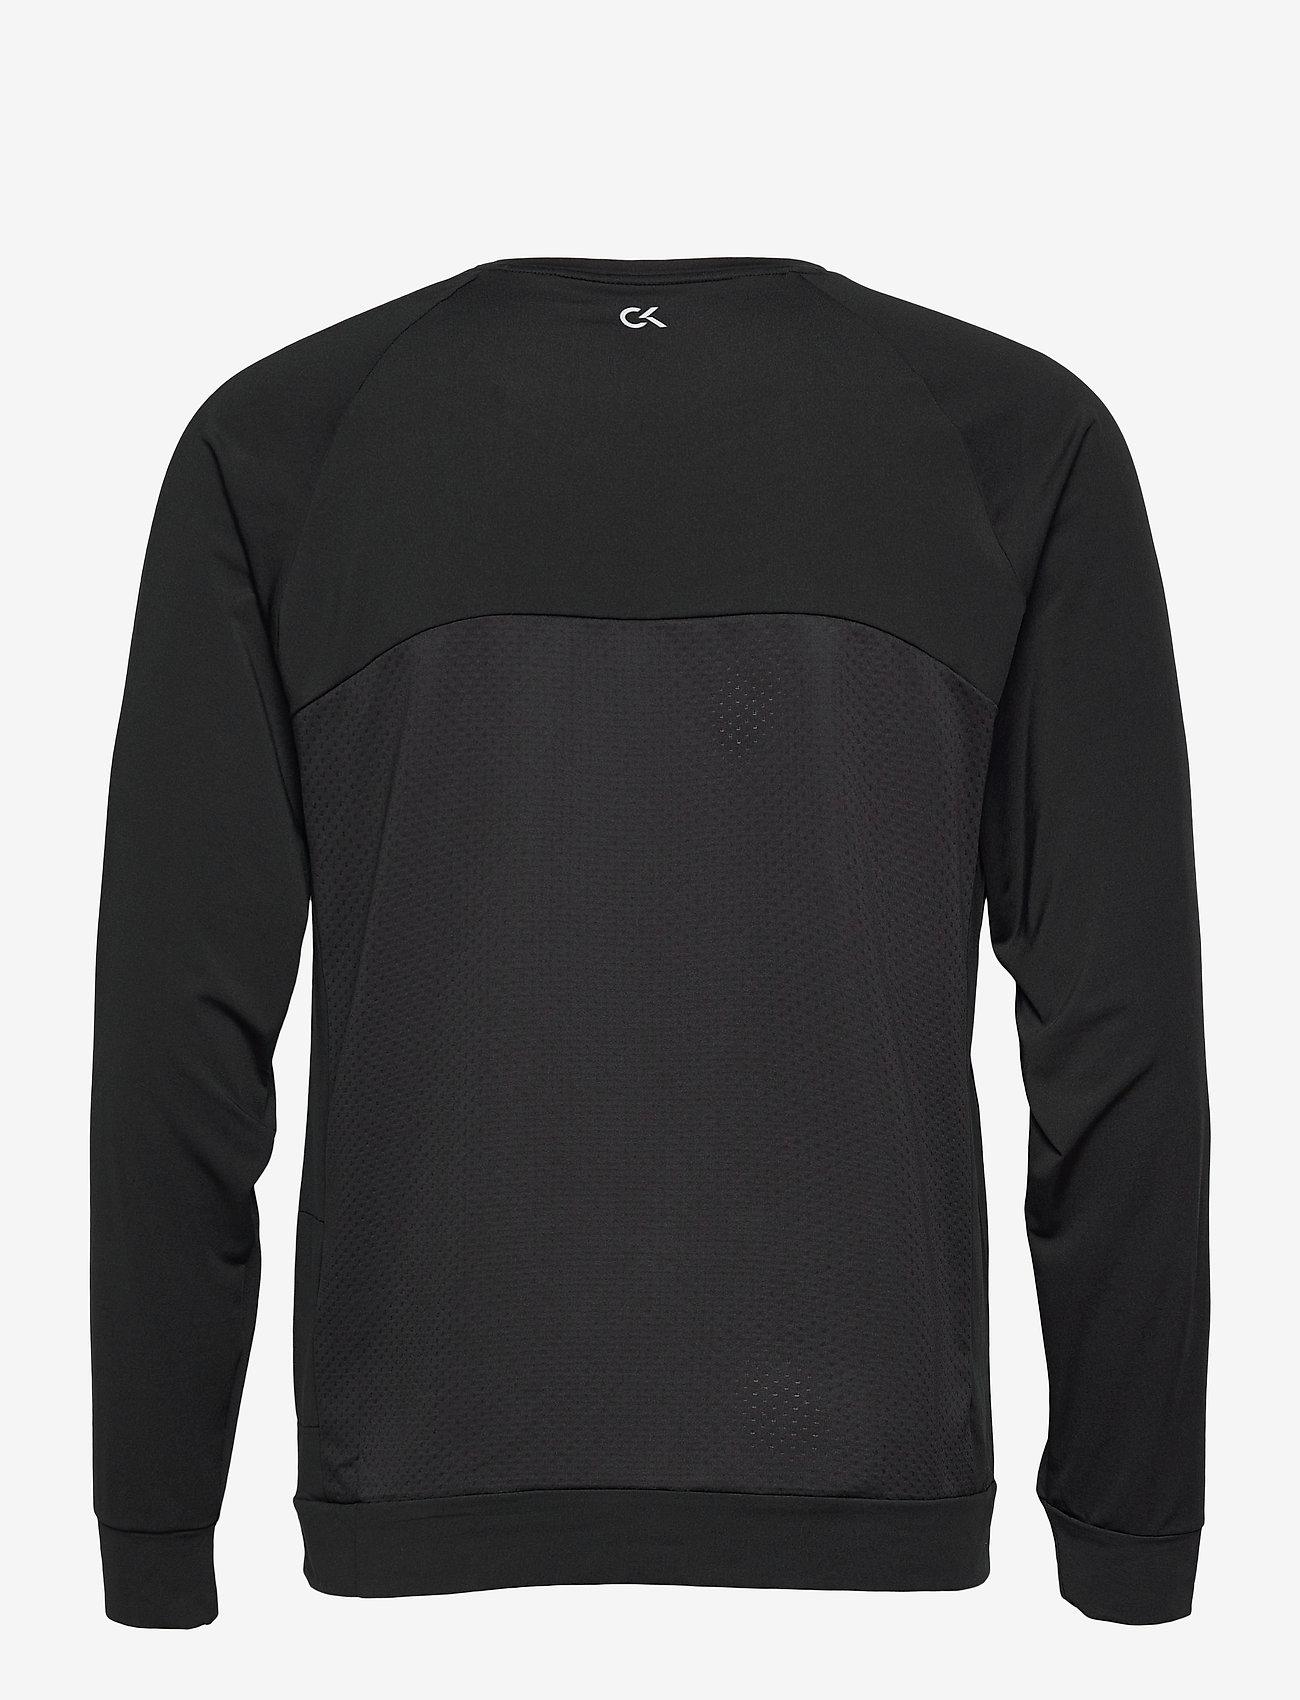 Calvin Klein Performance - WO - LONG SLEEVE T-SHIRT - hauts à manches longues - ck black - 1